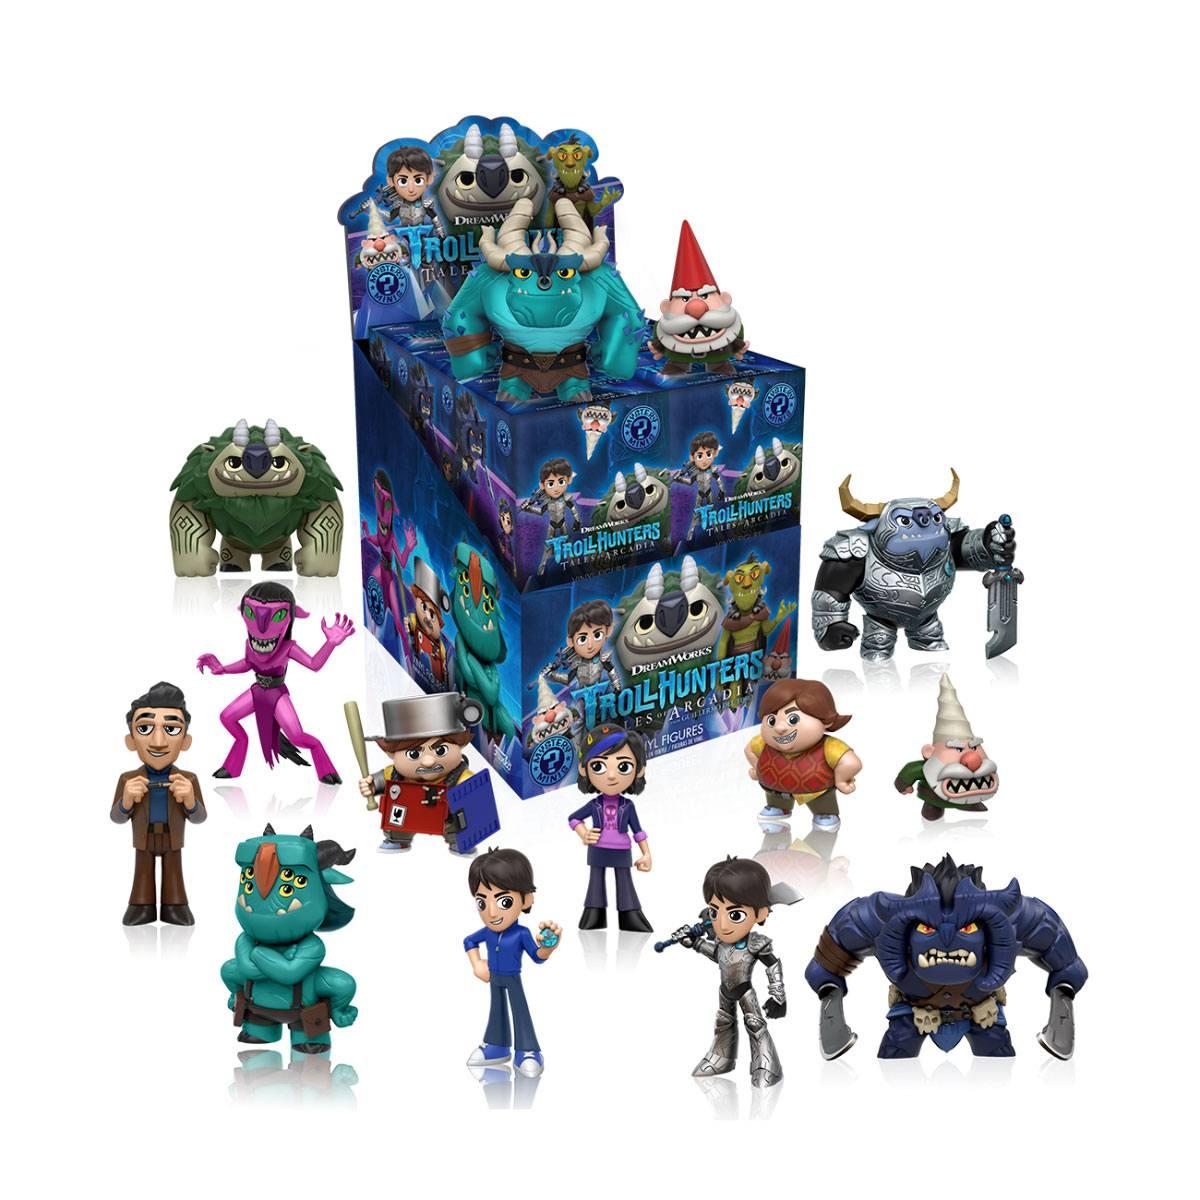 Trollhunters Mystery Mini Figures 5 cm Display (12)